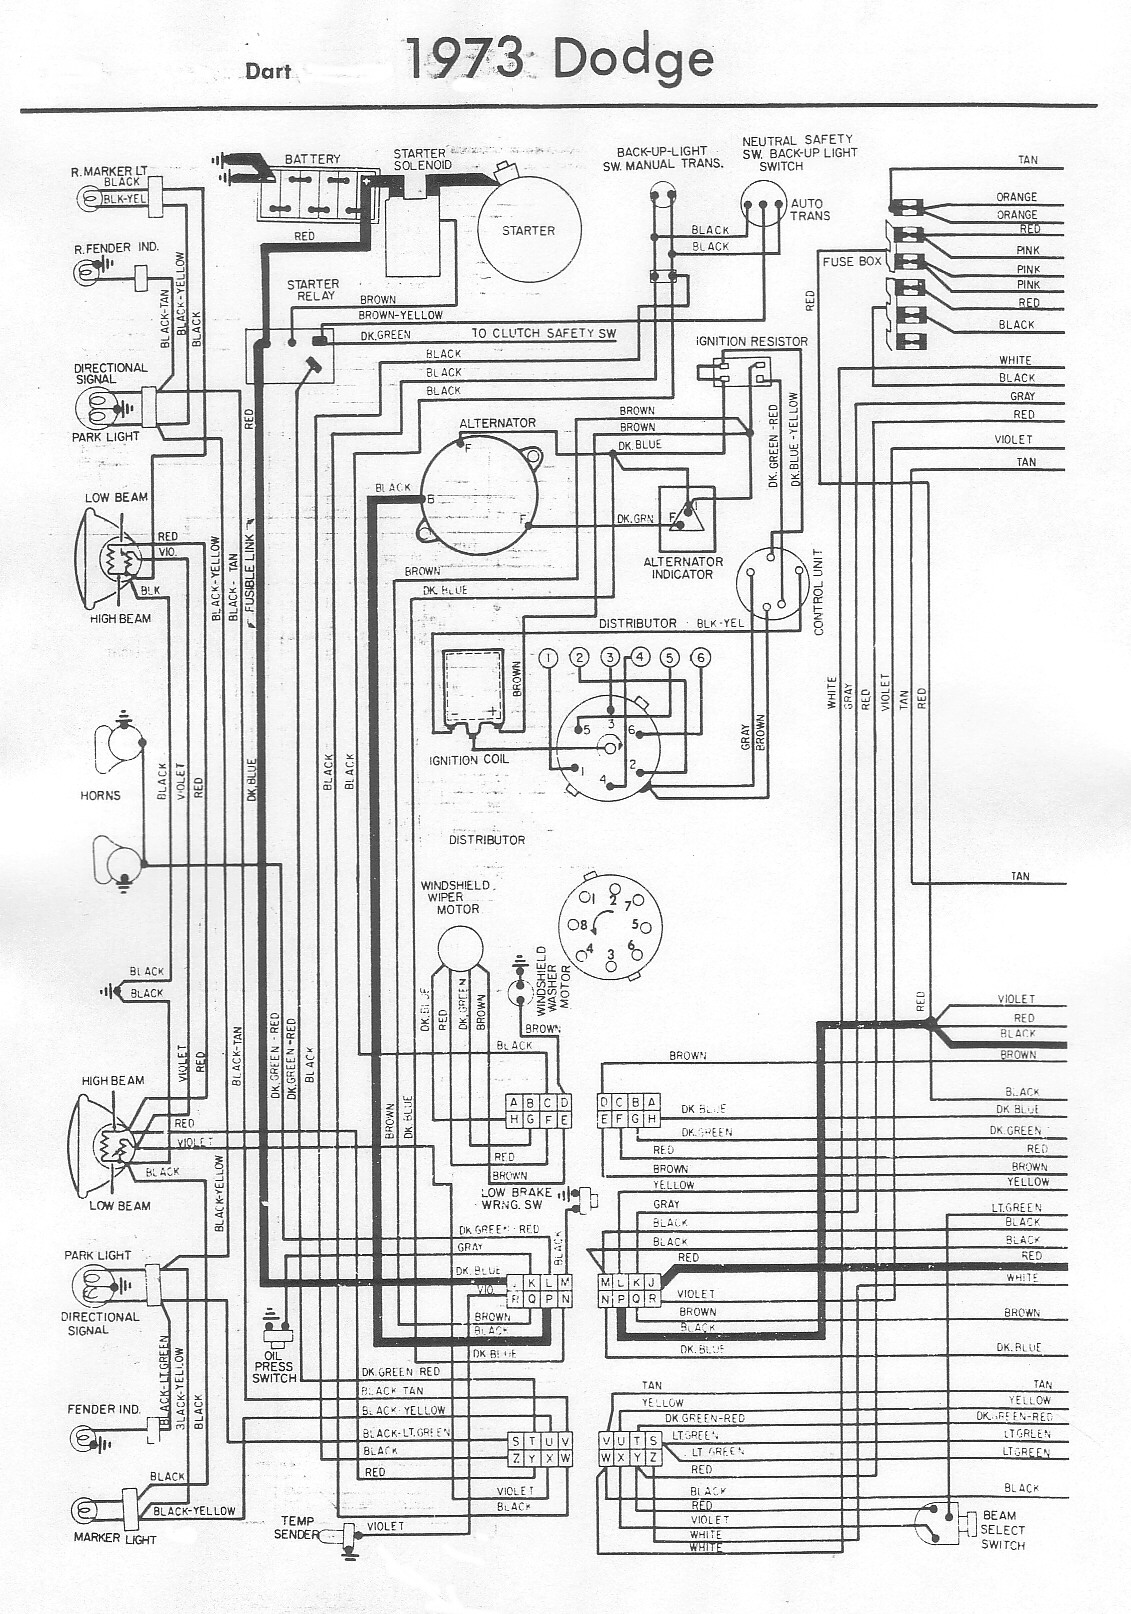 dodge dart wiring diagrams wiring diagram yer 74 dodge dart wiring diagram [ 1131 x 1614 Pixel ]